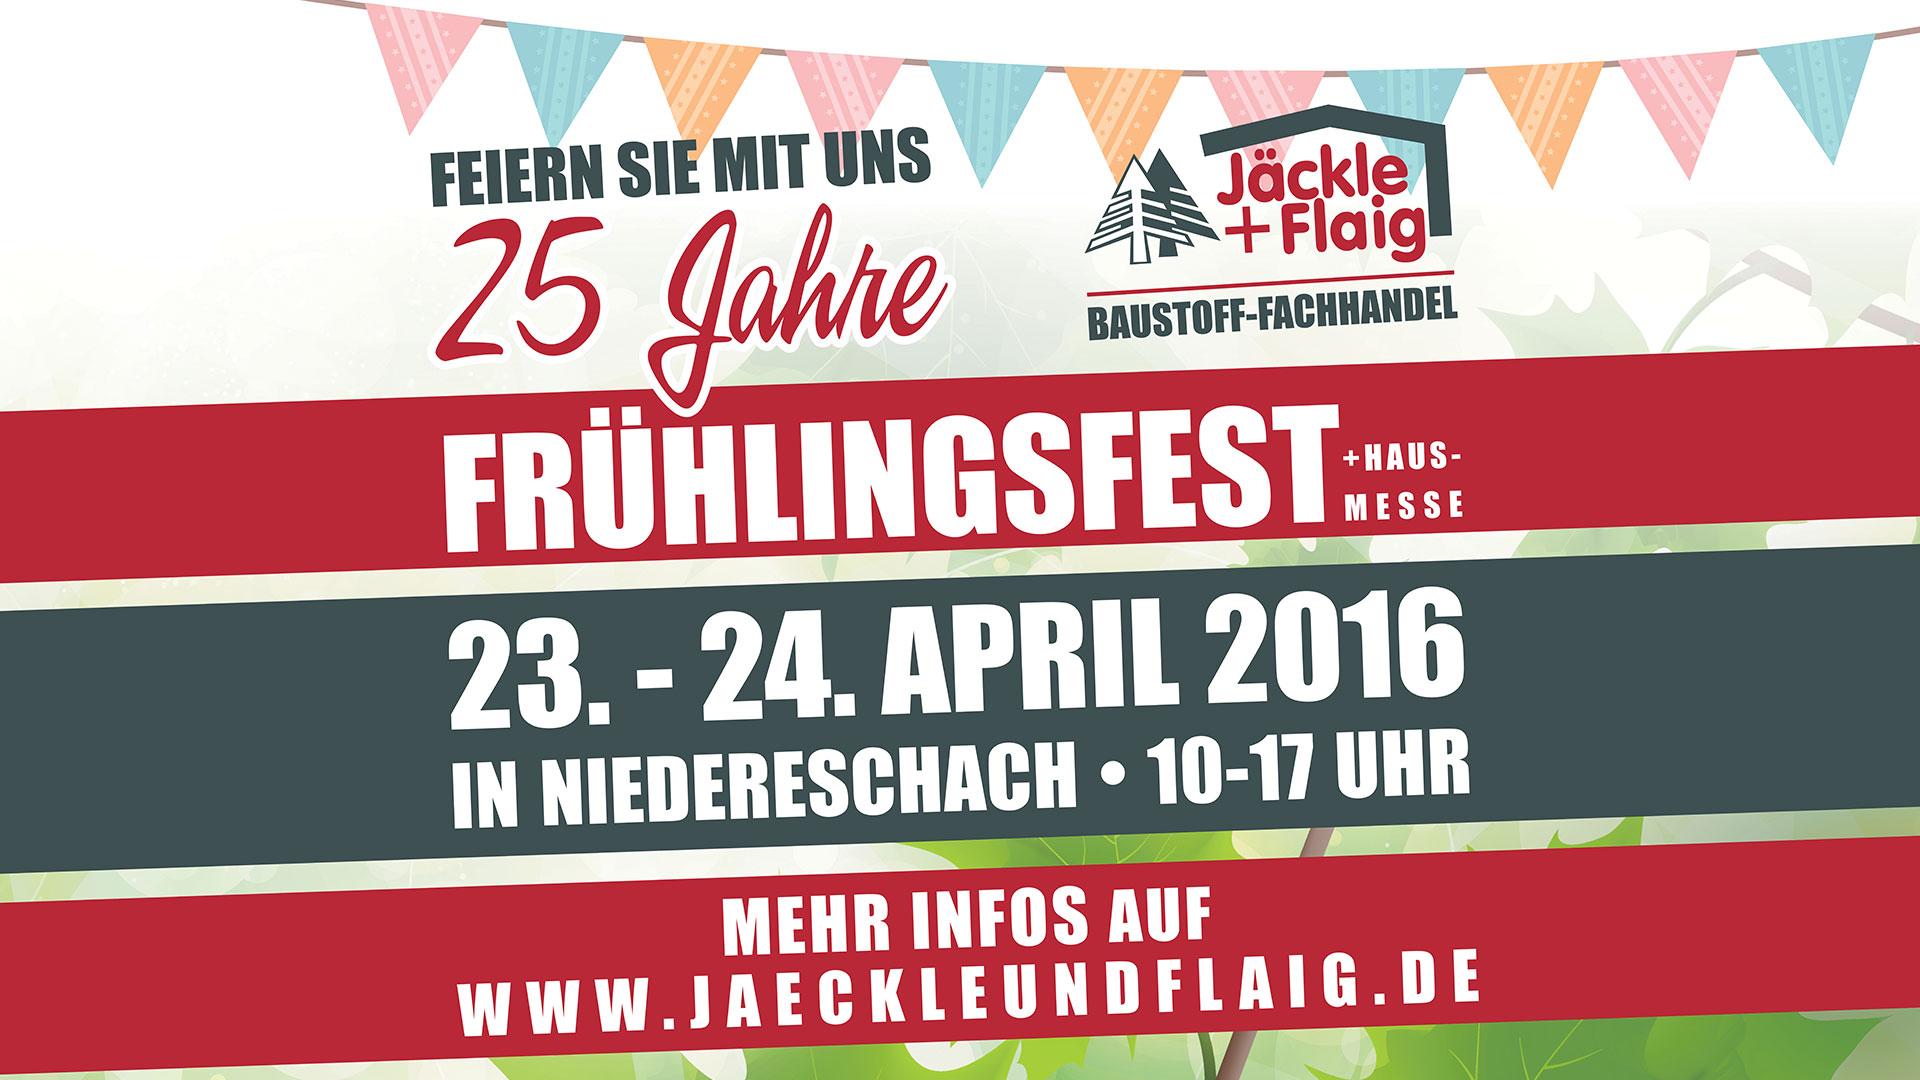 Jäckle+Flaig – Frühlingsfest 2016